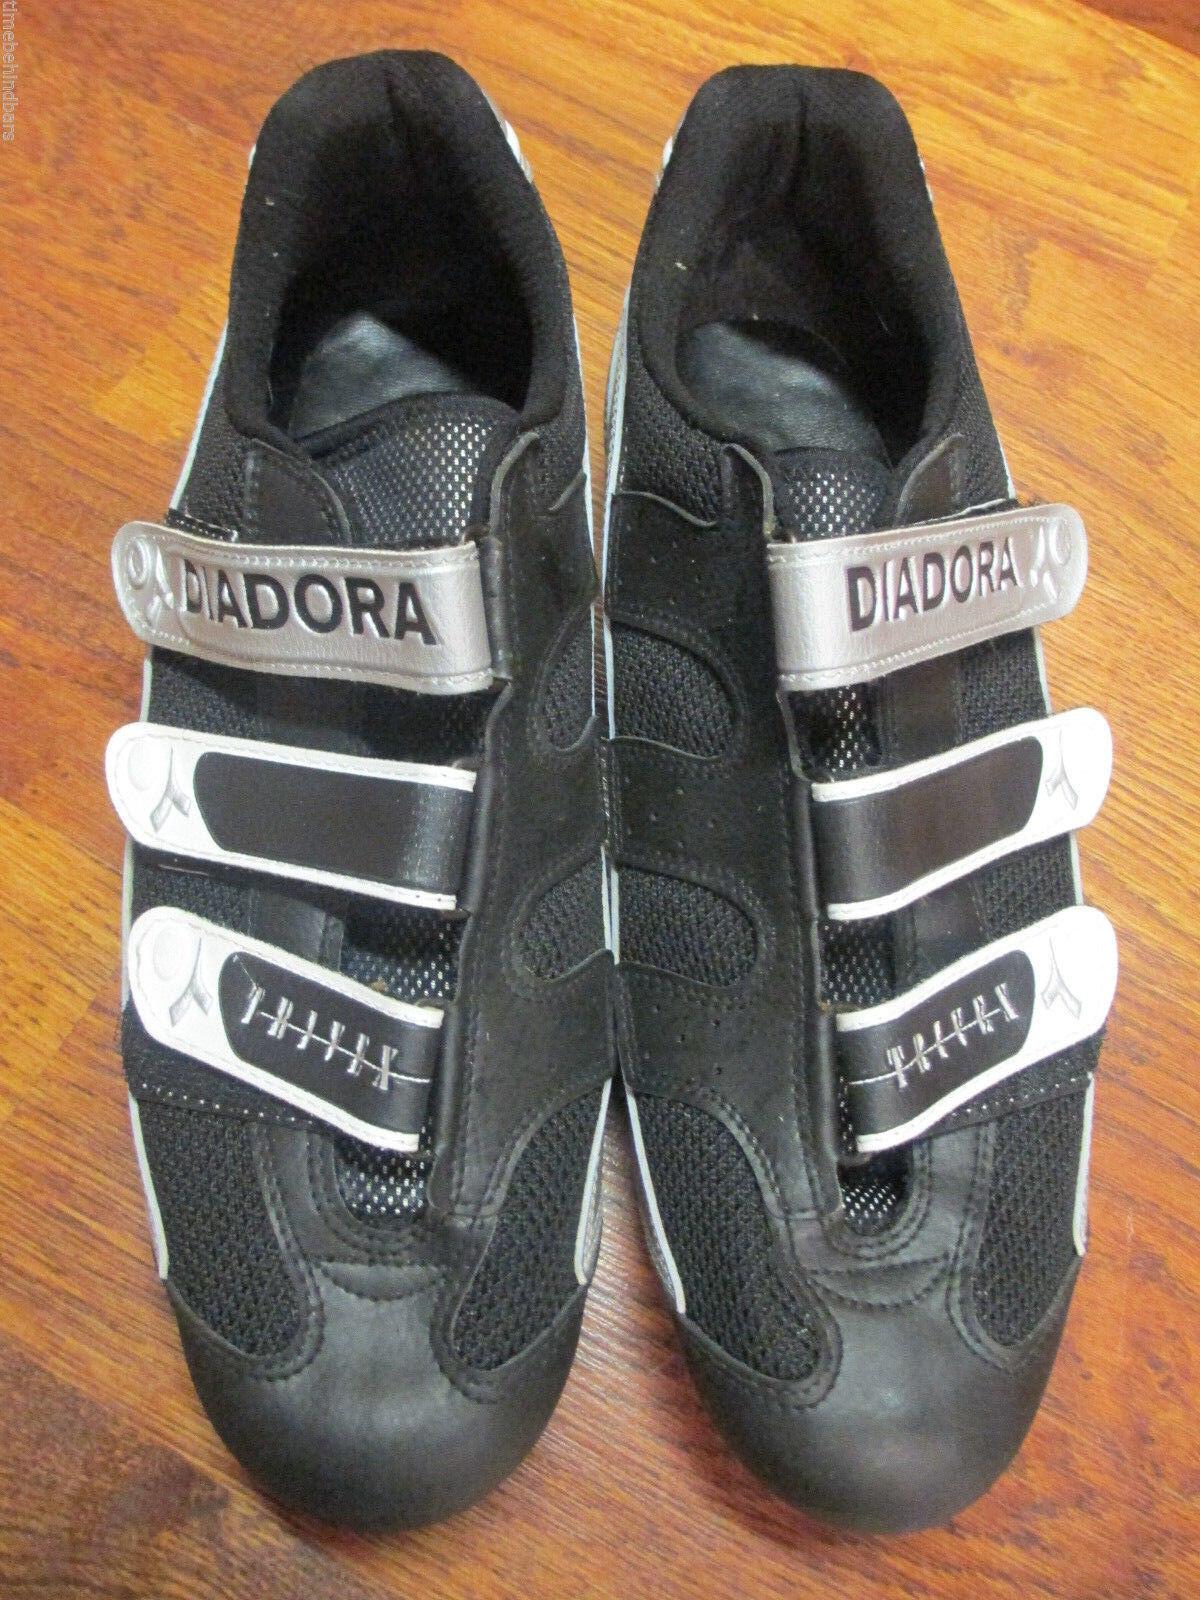 DIADORA TRIVEZ ROAD BIKE CYCLING SHOES 45